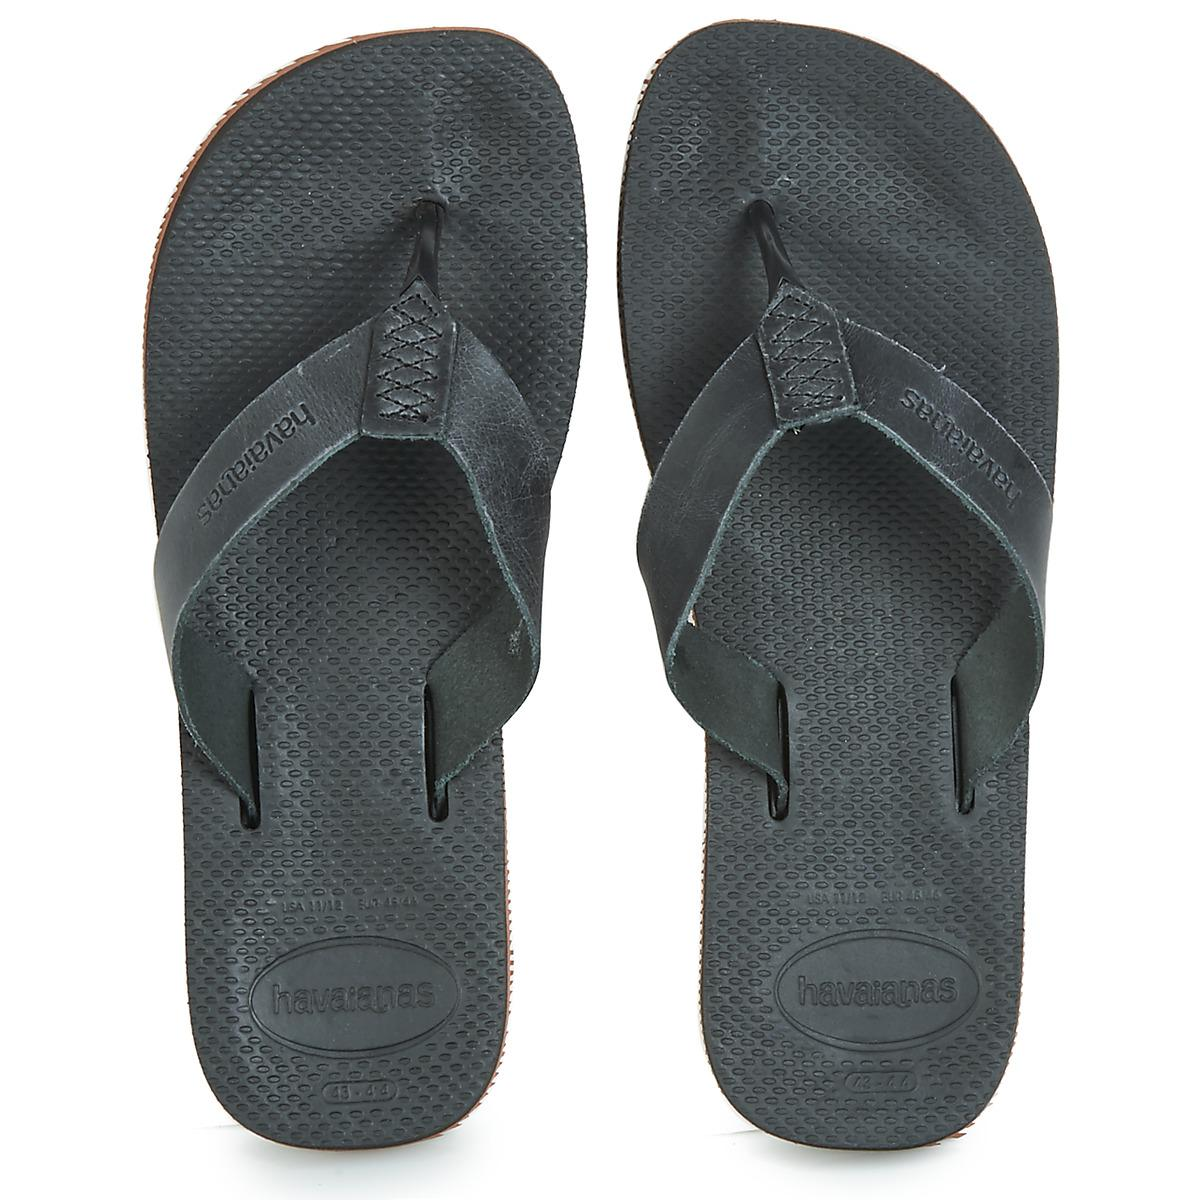 7f3146adc Havaianas Urban Special Men s Flip Flops   Sandals (shoes) In Black in  Black for Men - Lyst